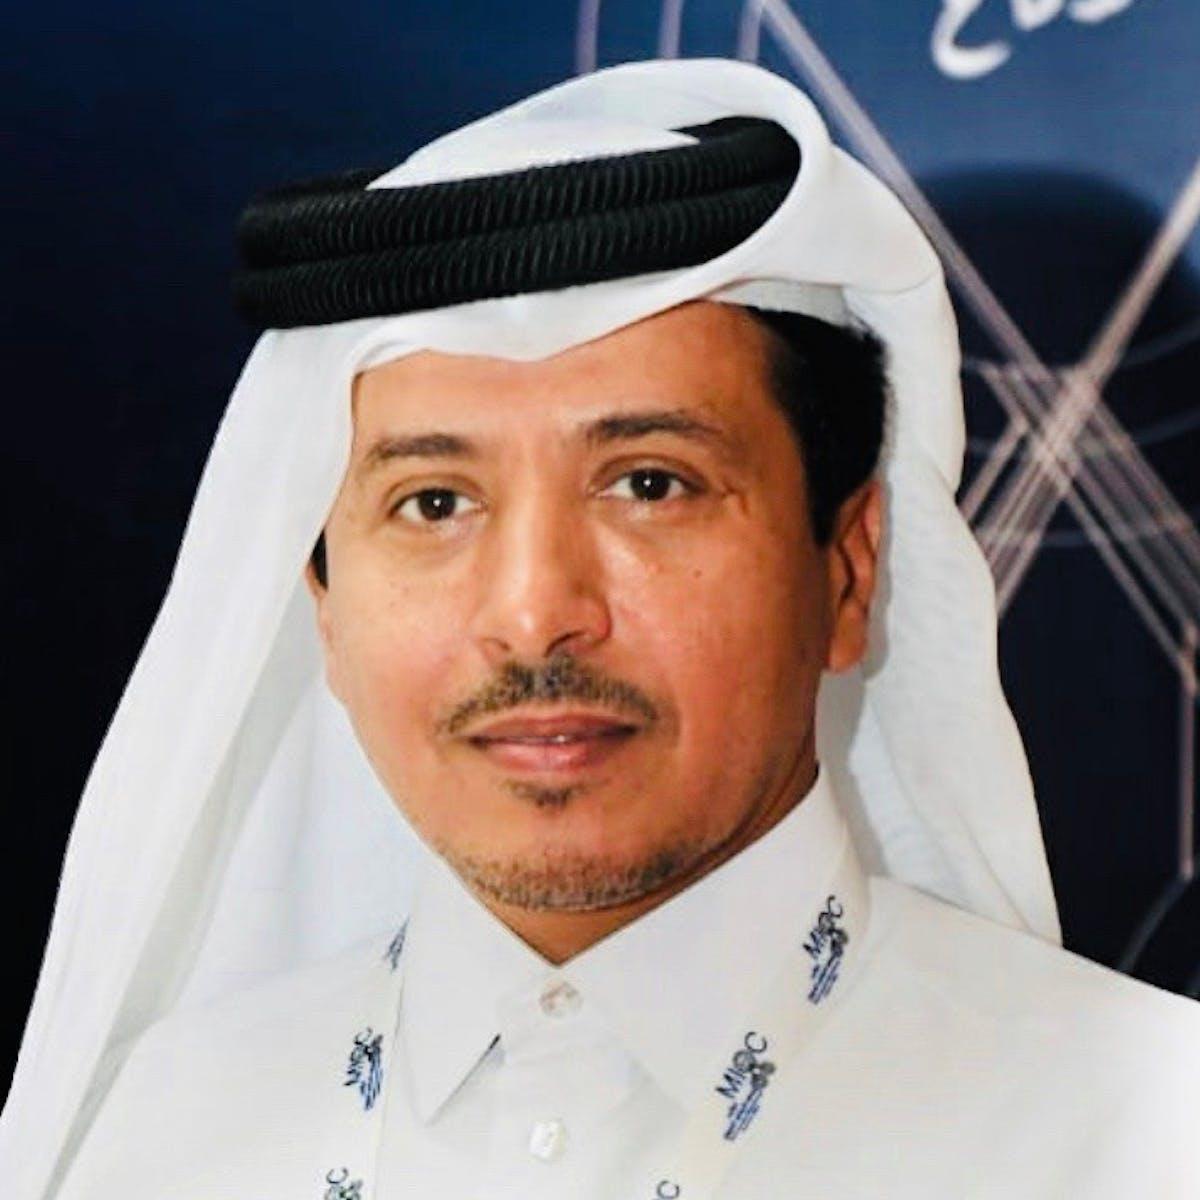 Dr Faisal Naqadan